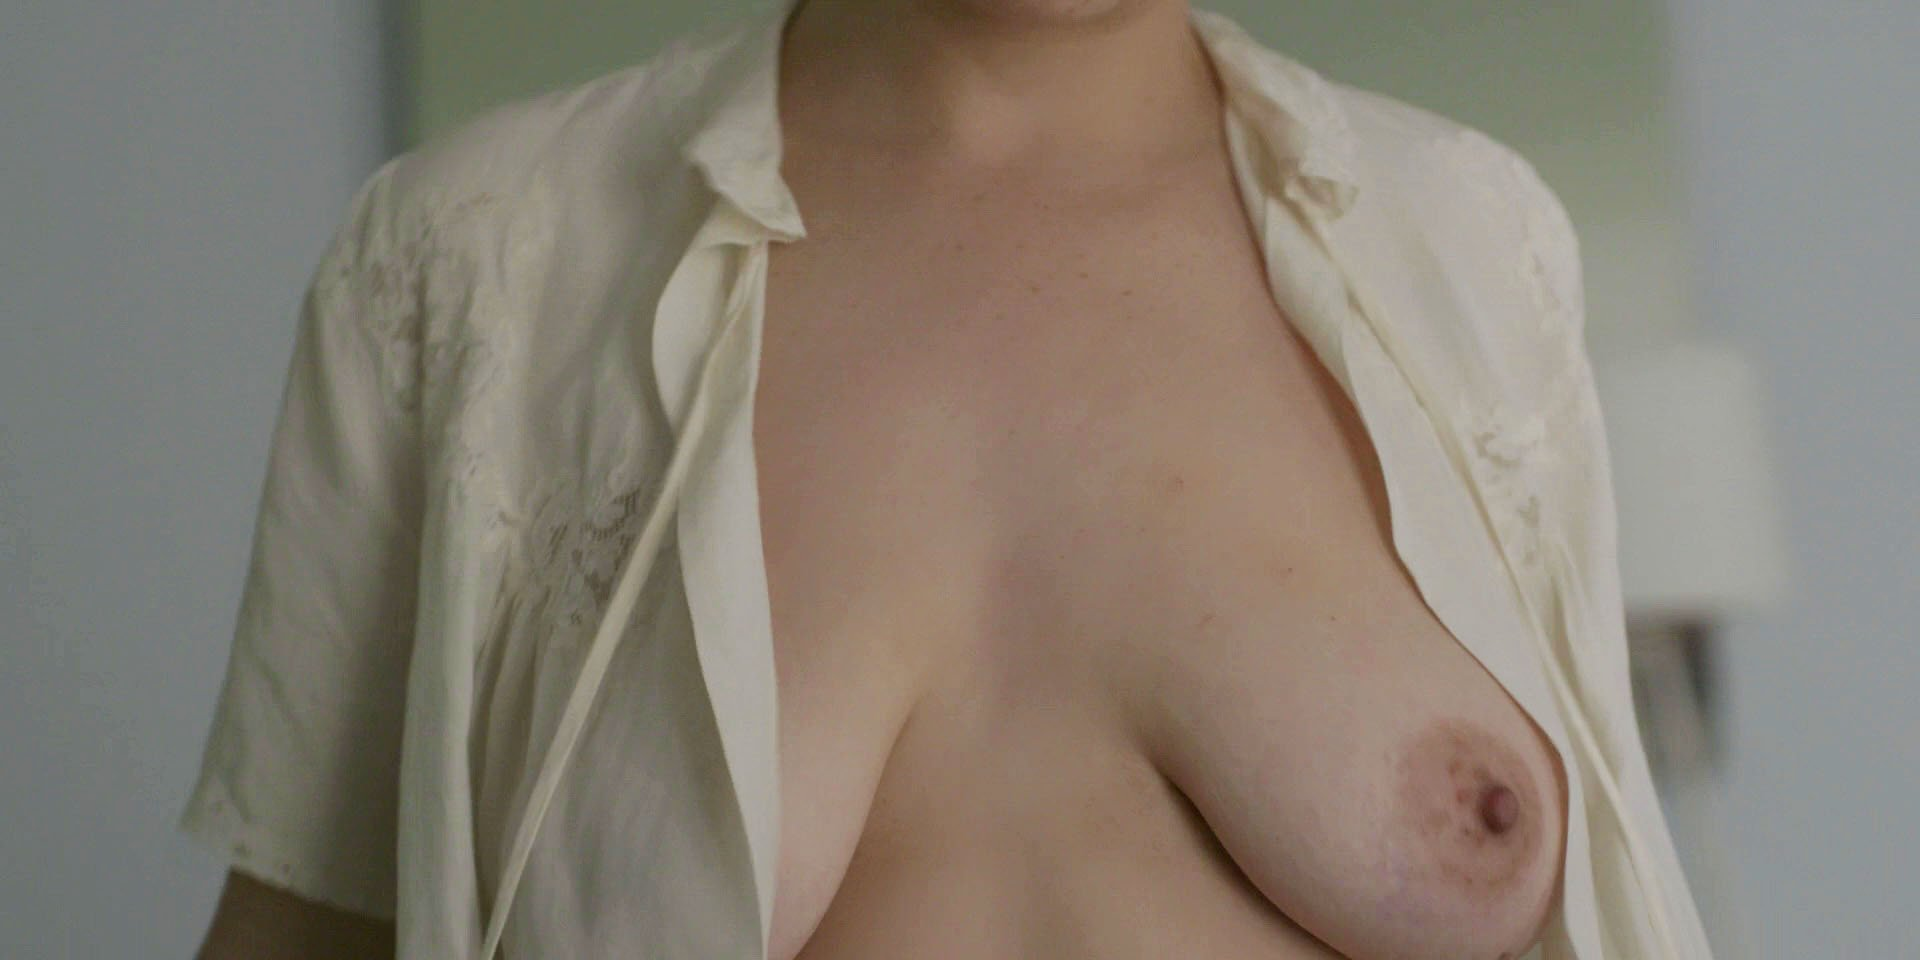 Alia Shawkat nude - Transparent s04e02 (2017)